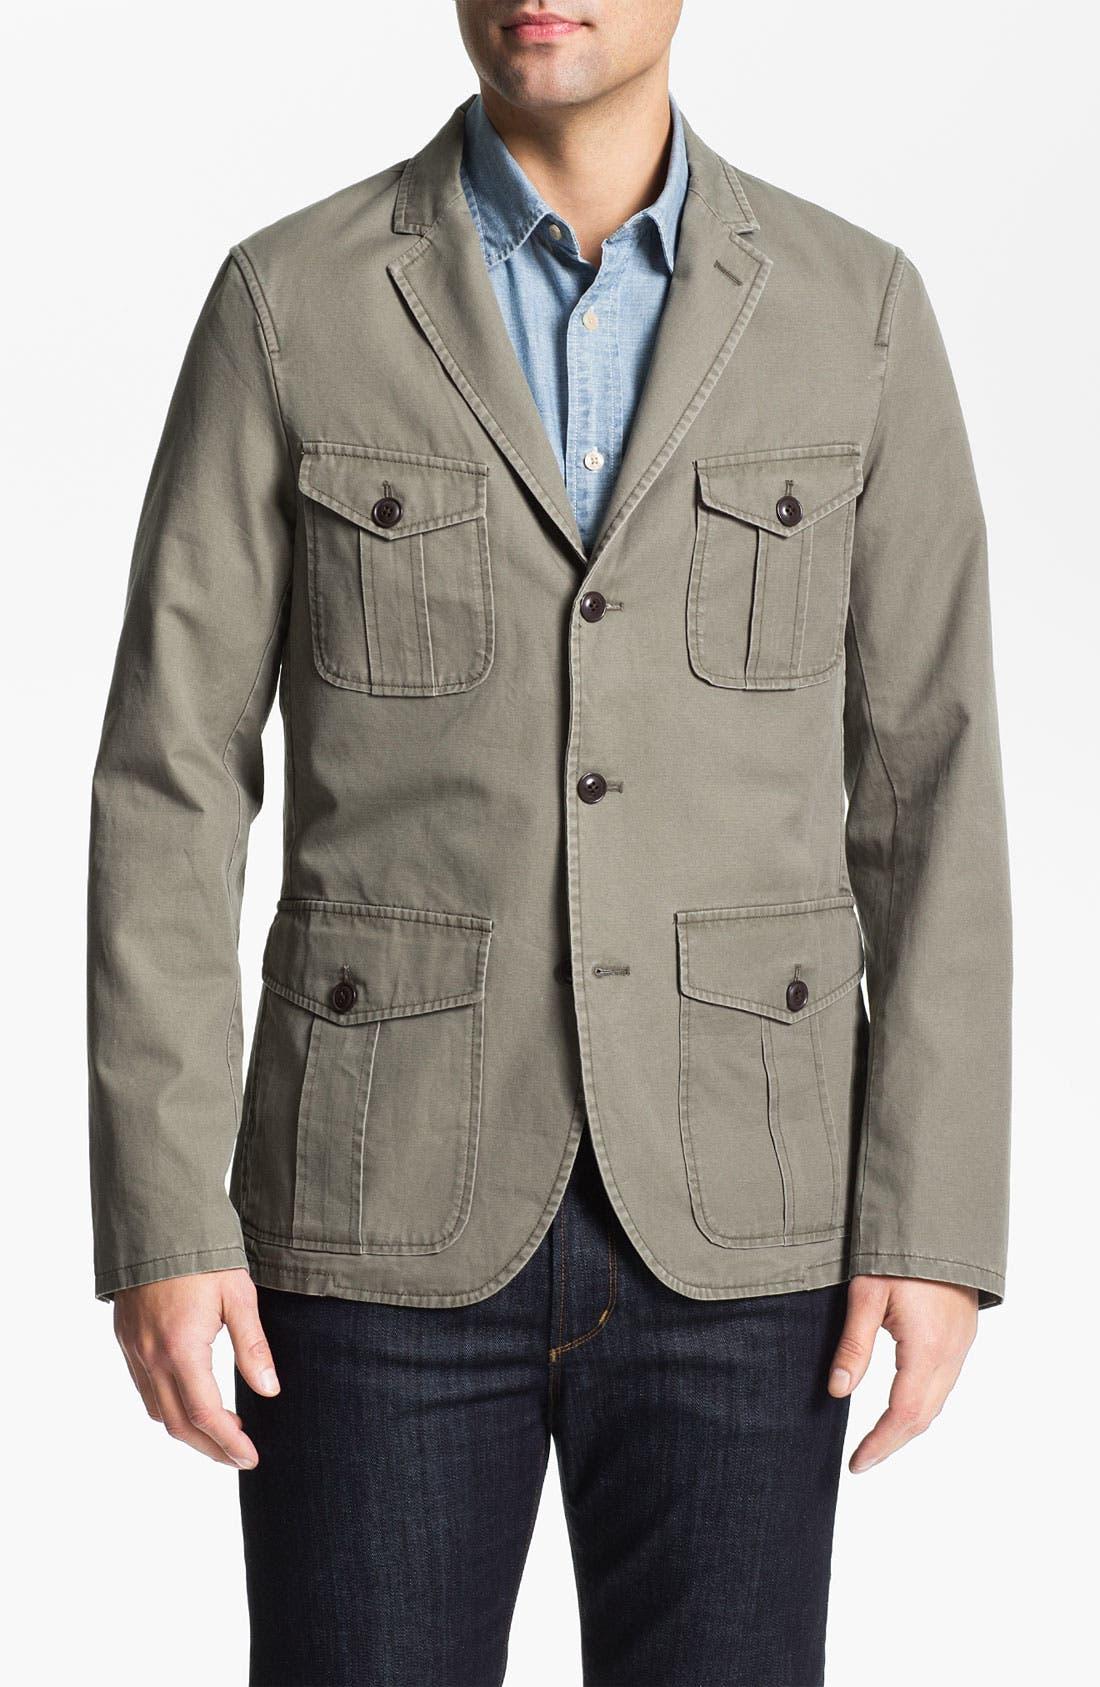 Alternate Image 1 Selected - Wallin & Bros. Sportcoat